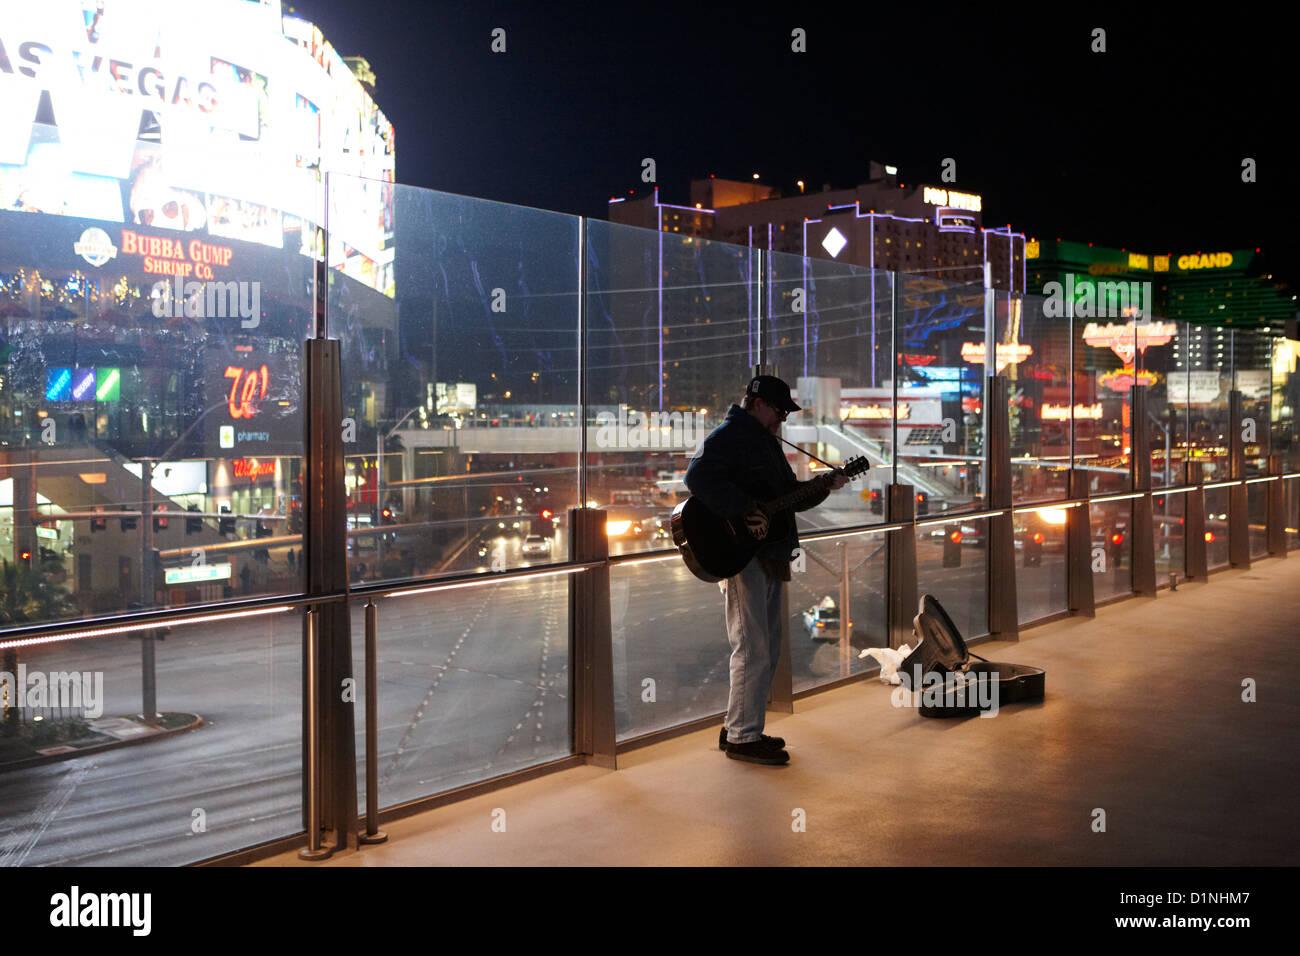 busker playing guitar on overhead walkway on Las Vegas boulevard Nevada USA - Stock Image